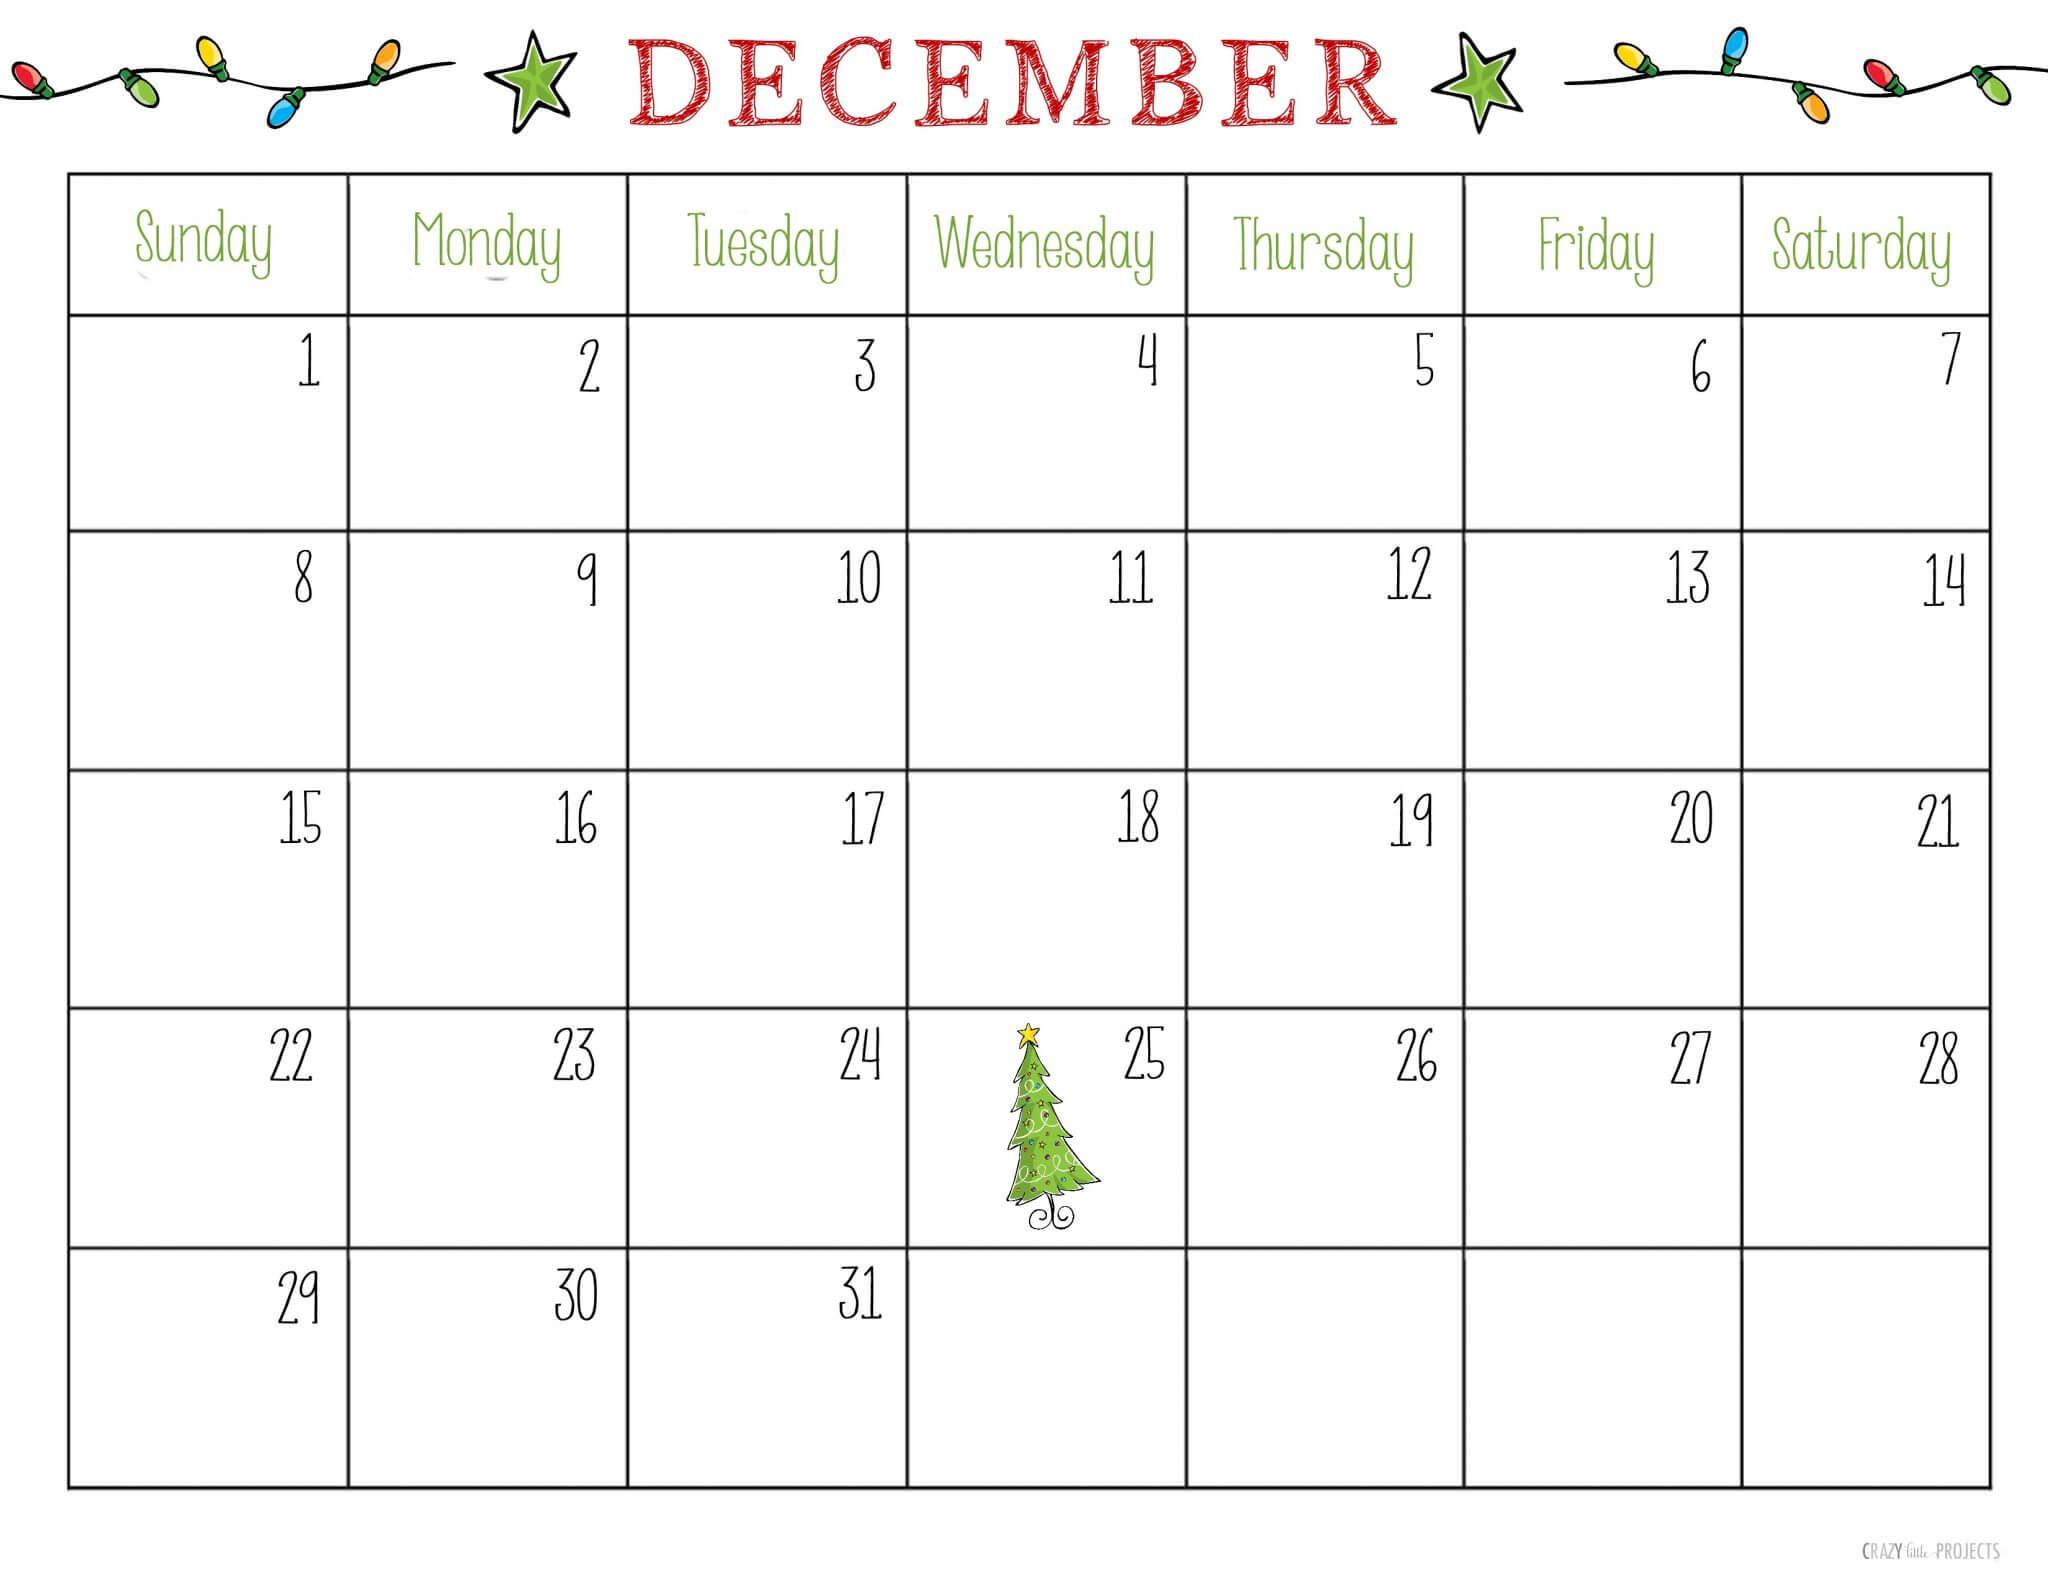 December 2018 Calendar Page For Kids – Free Printable For Blank Calendar Template For Kids